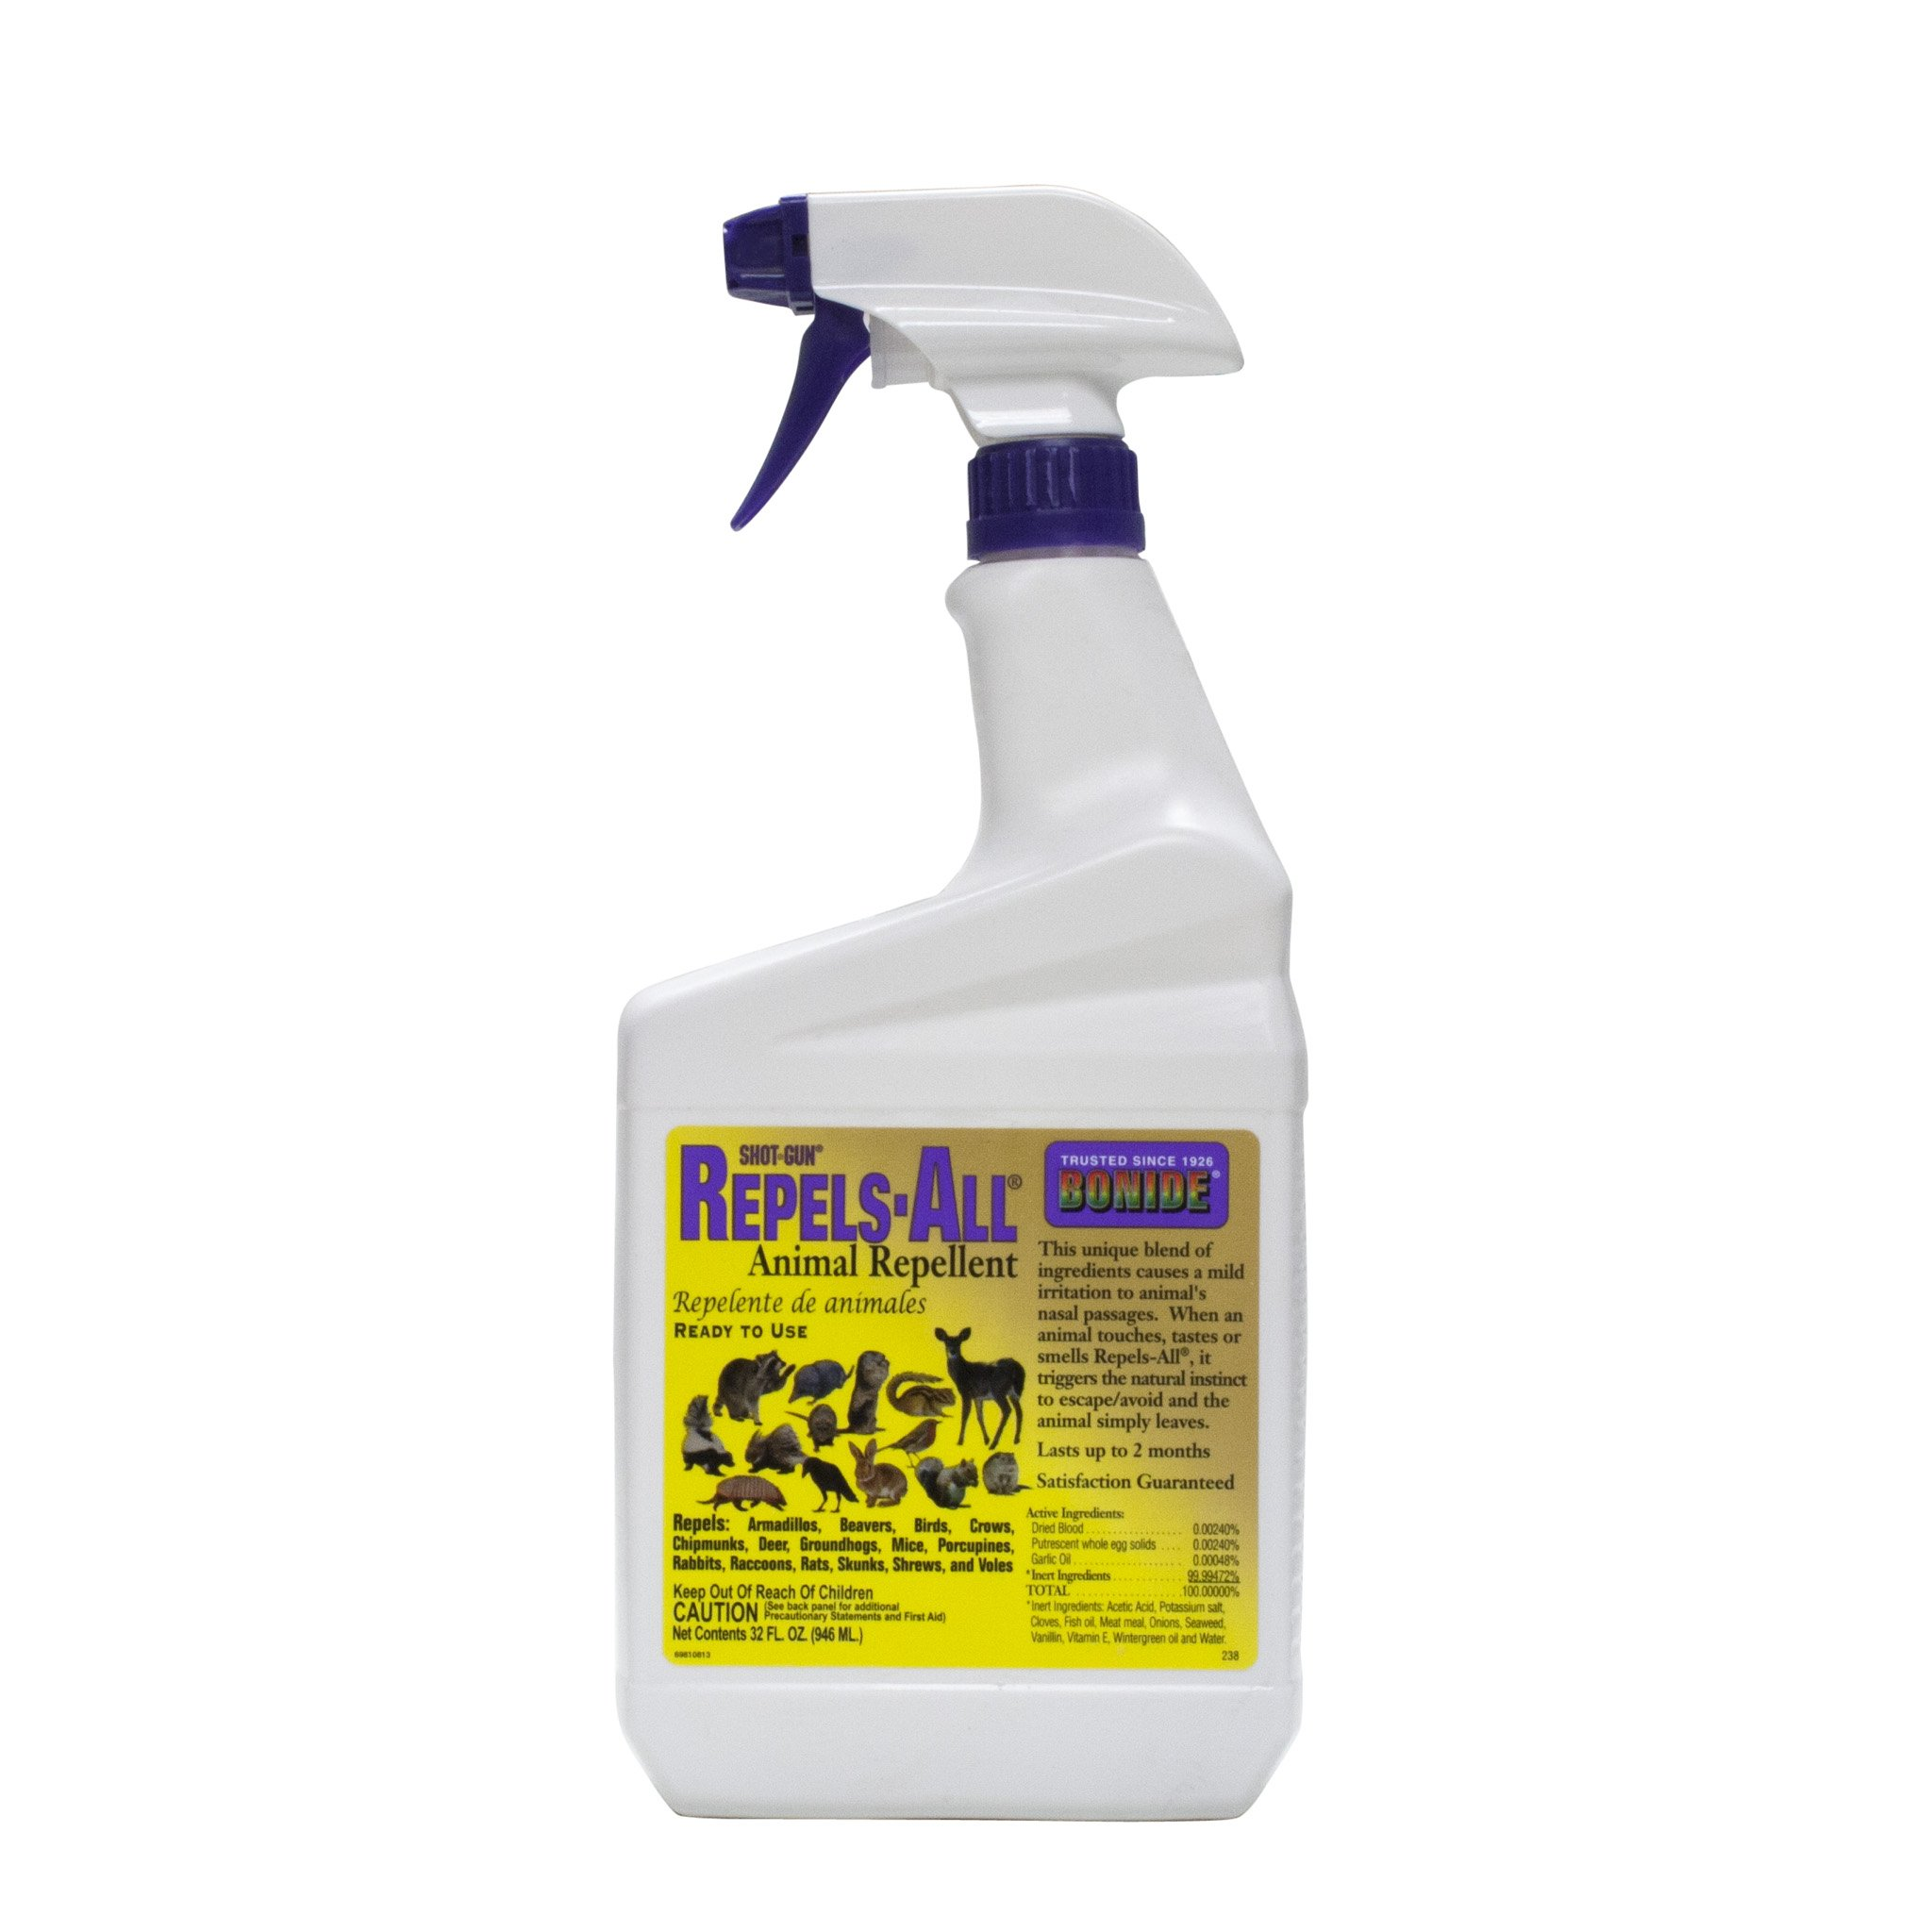 Bonide (BND238) - Repels-All Ready to Use Animal Repellent (32 fl oz.)